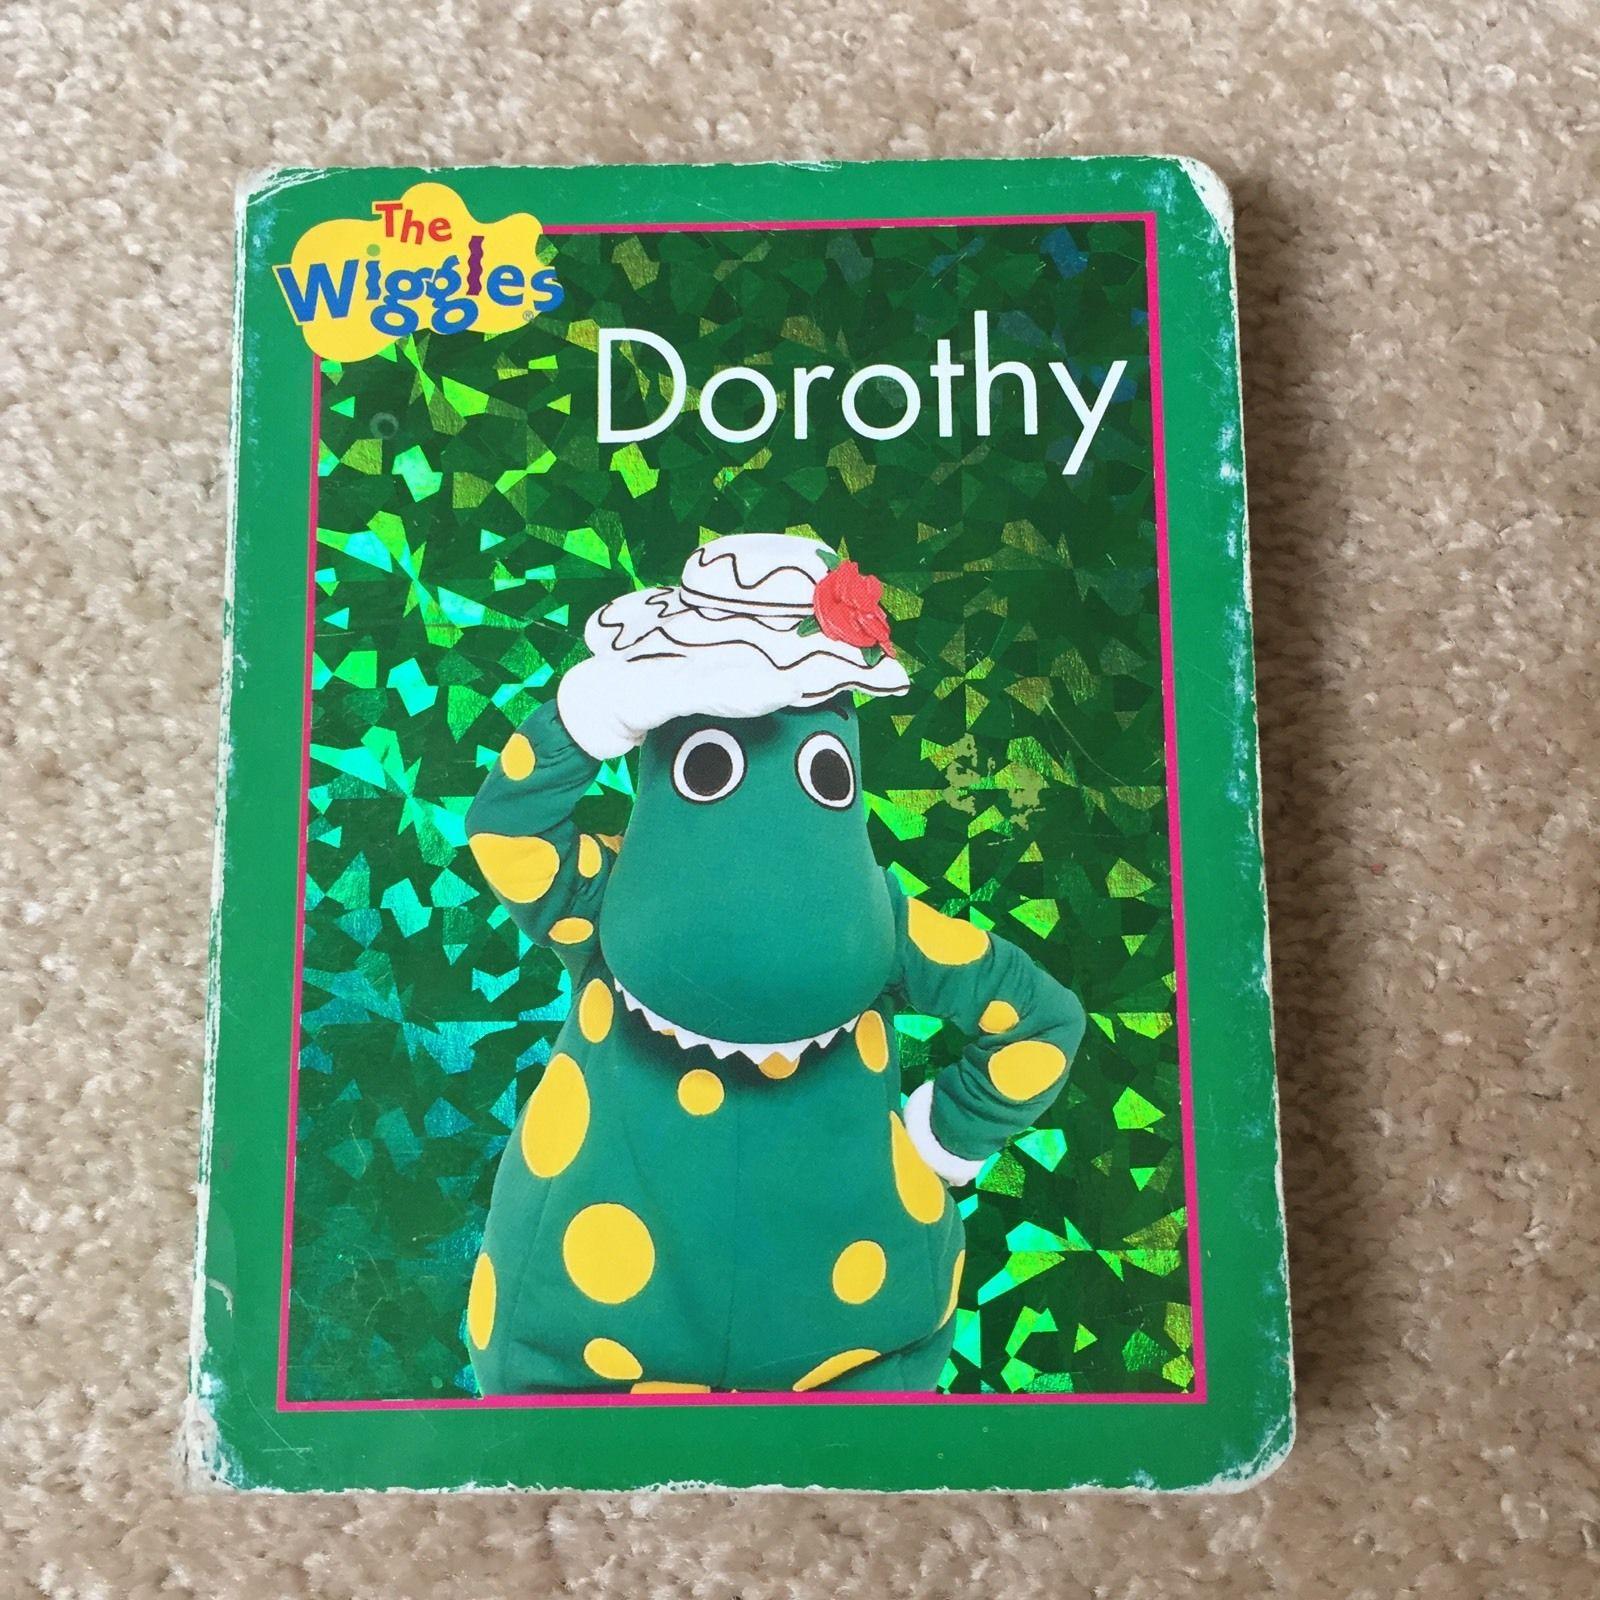 Dorothy (book)